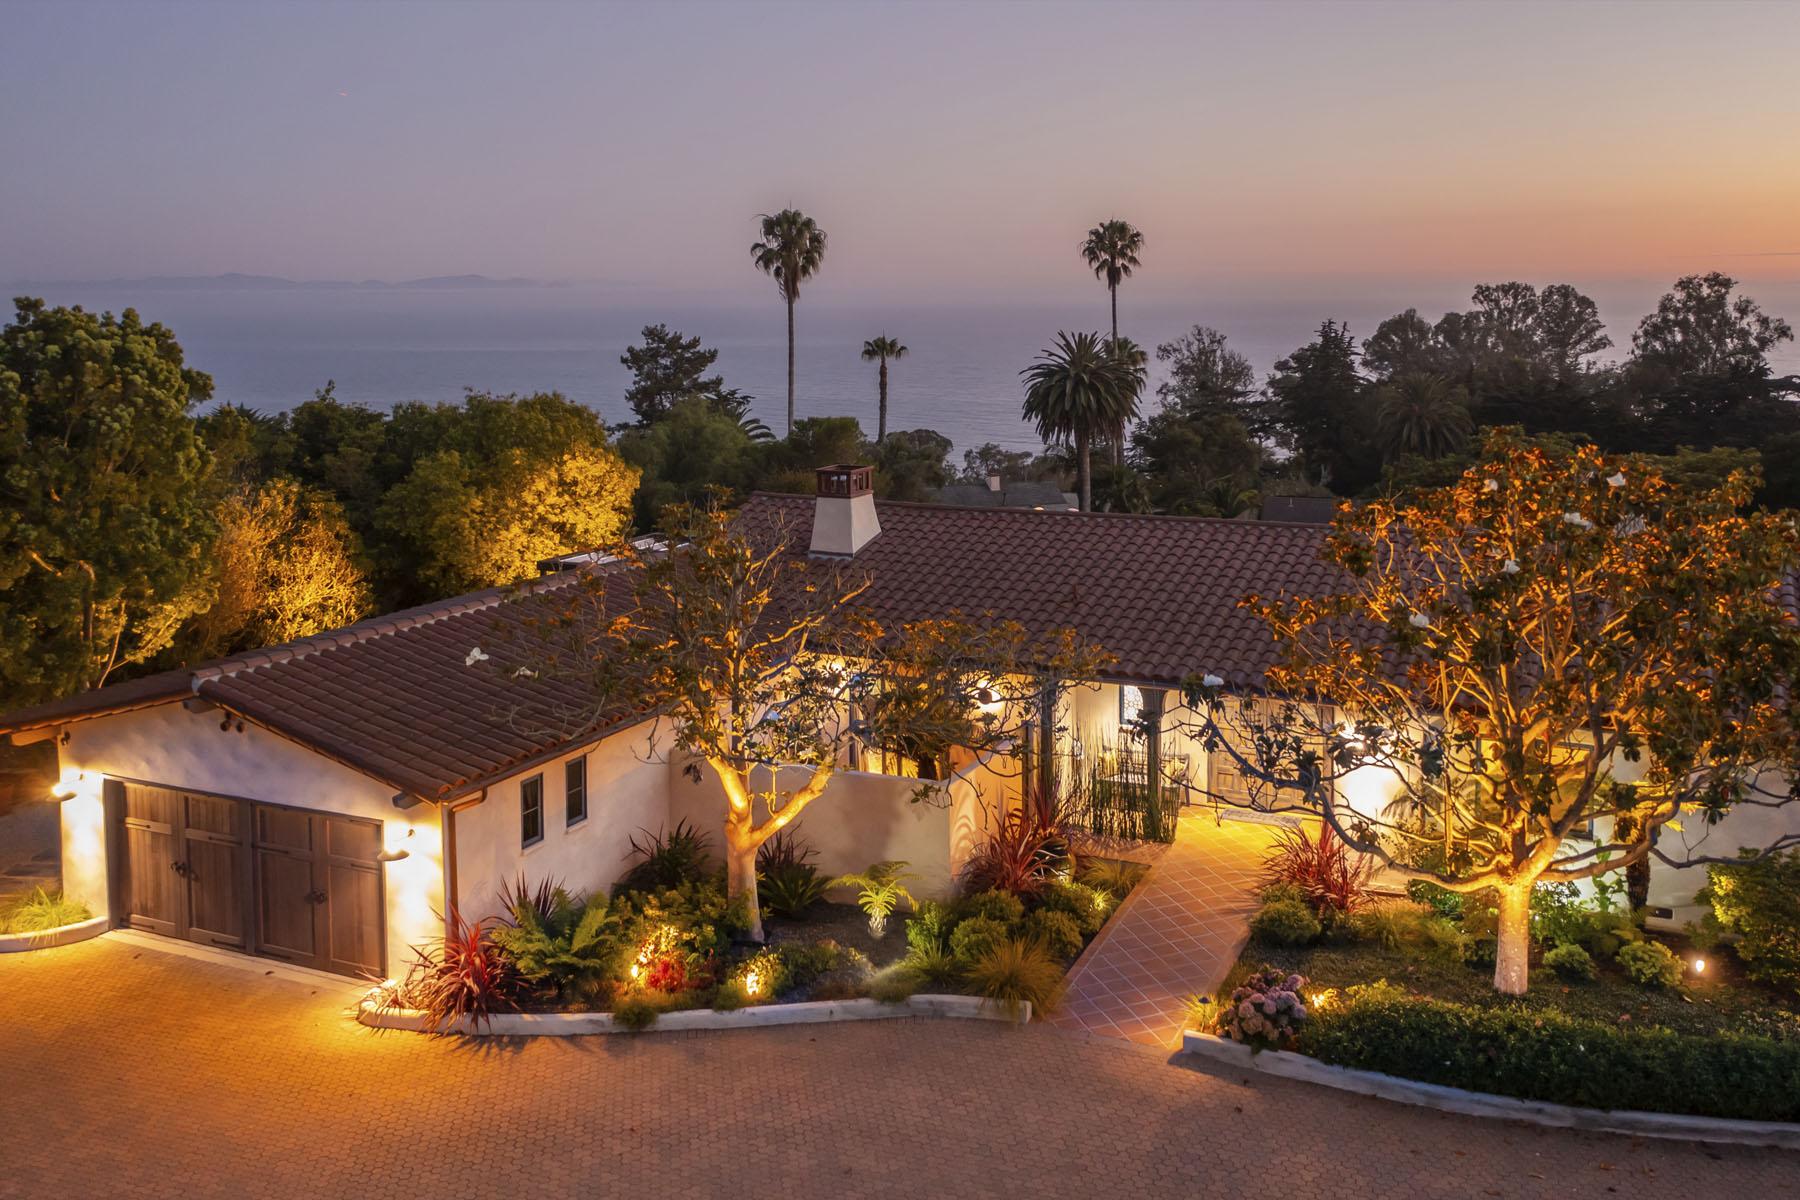 Campanil home exterior; Hope Ranch